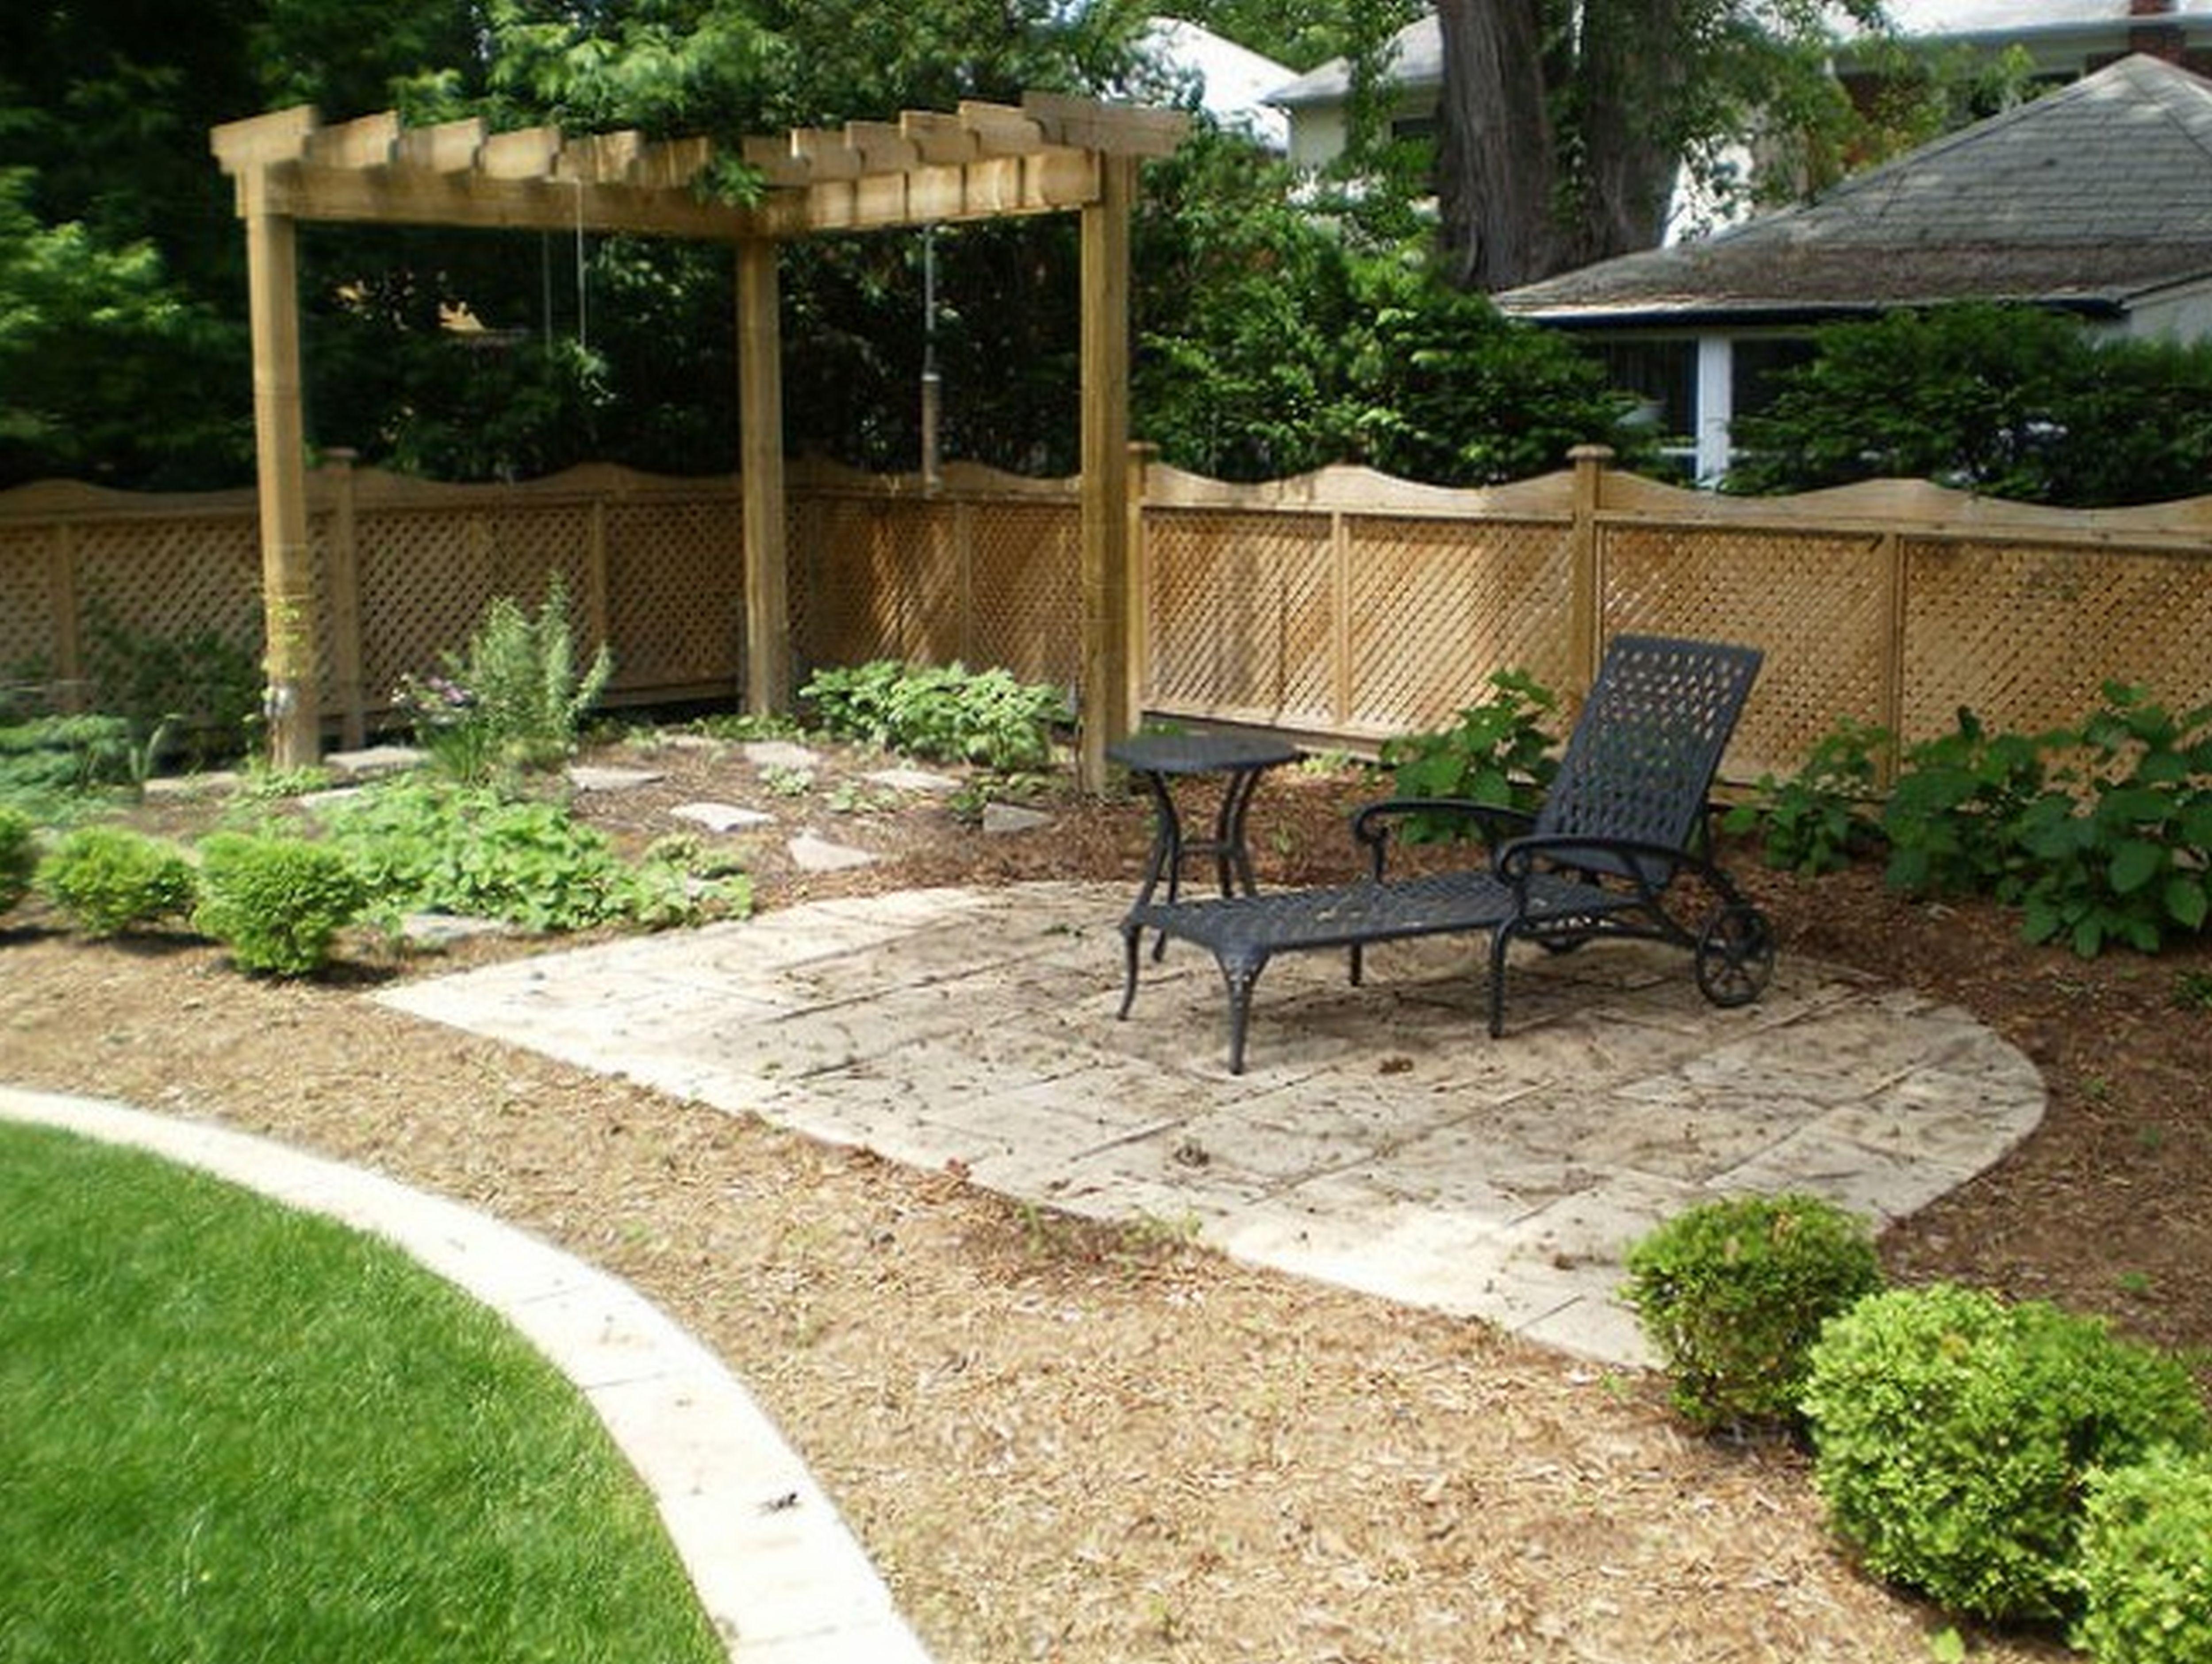 front yard desert landscape design - Google Search | Small ... on Desert Landscape Ideas For Backyards id=46503